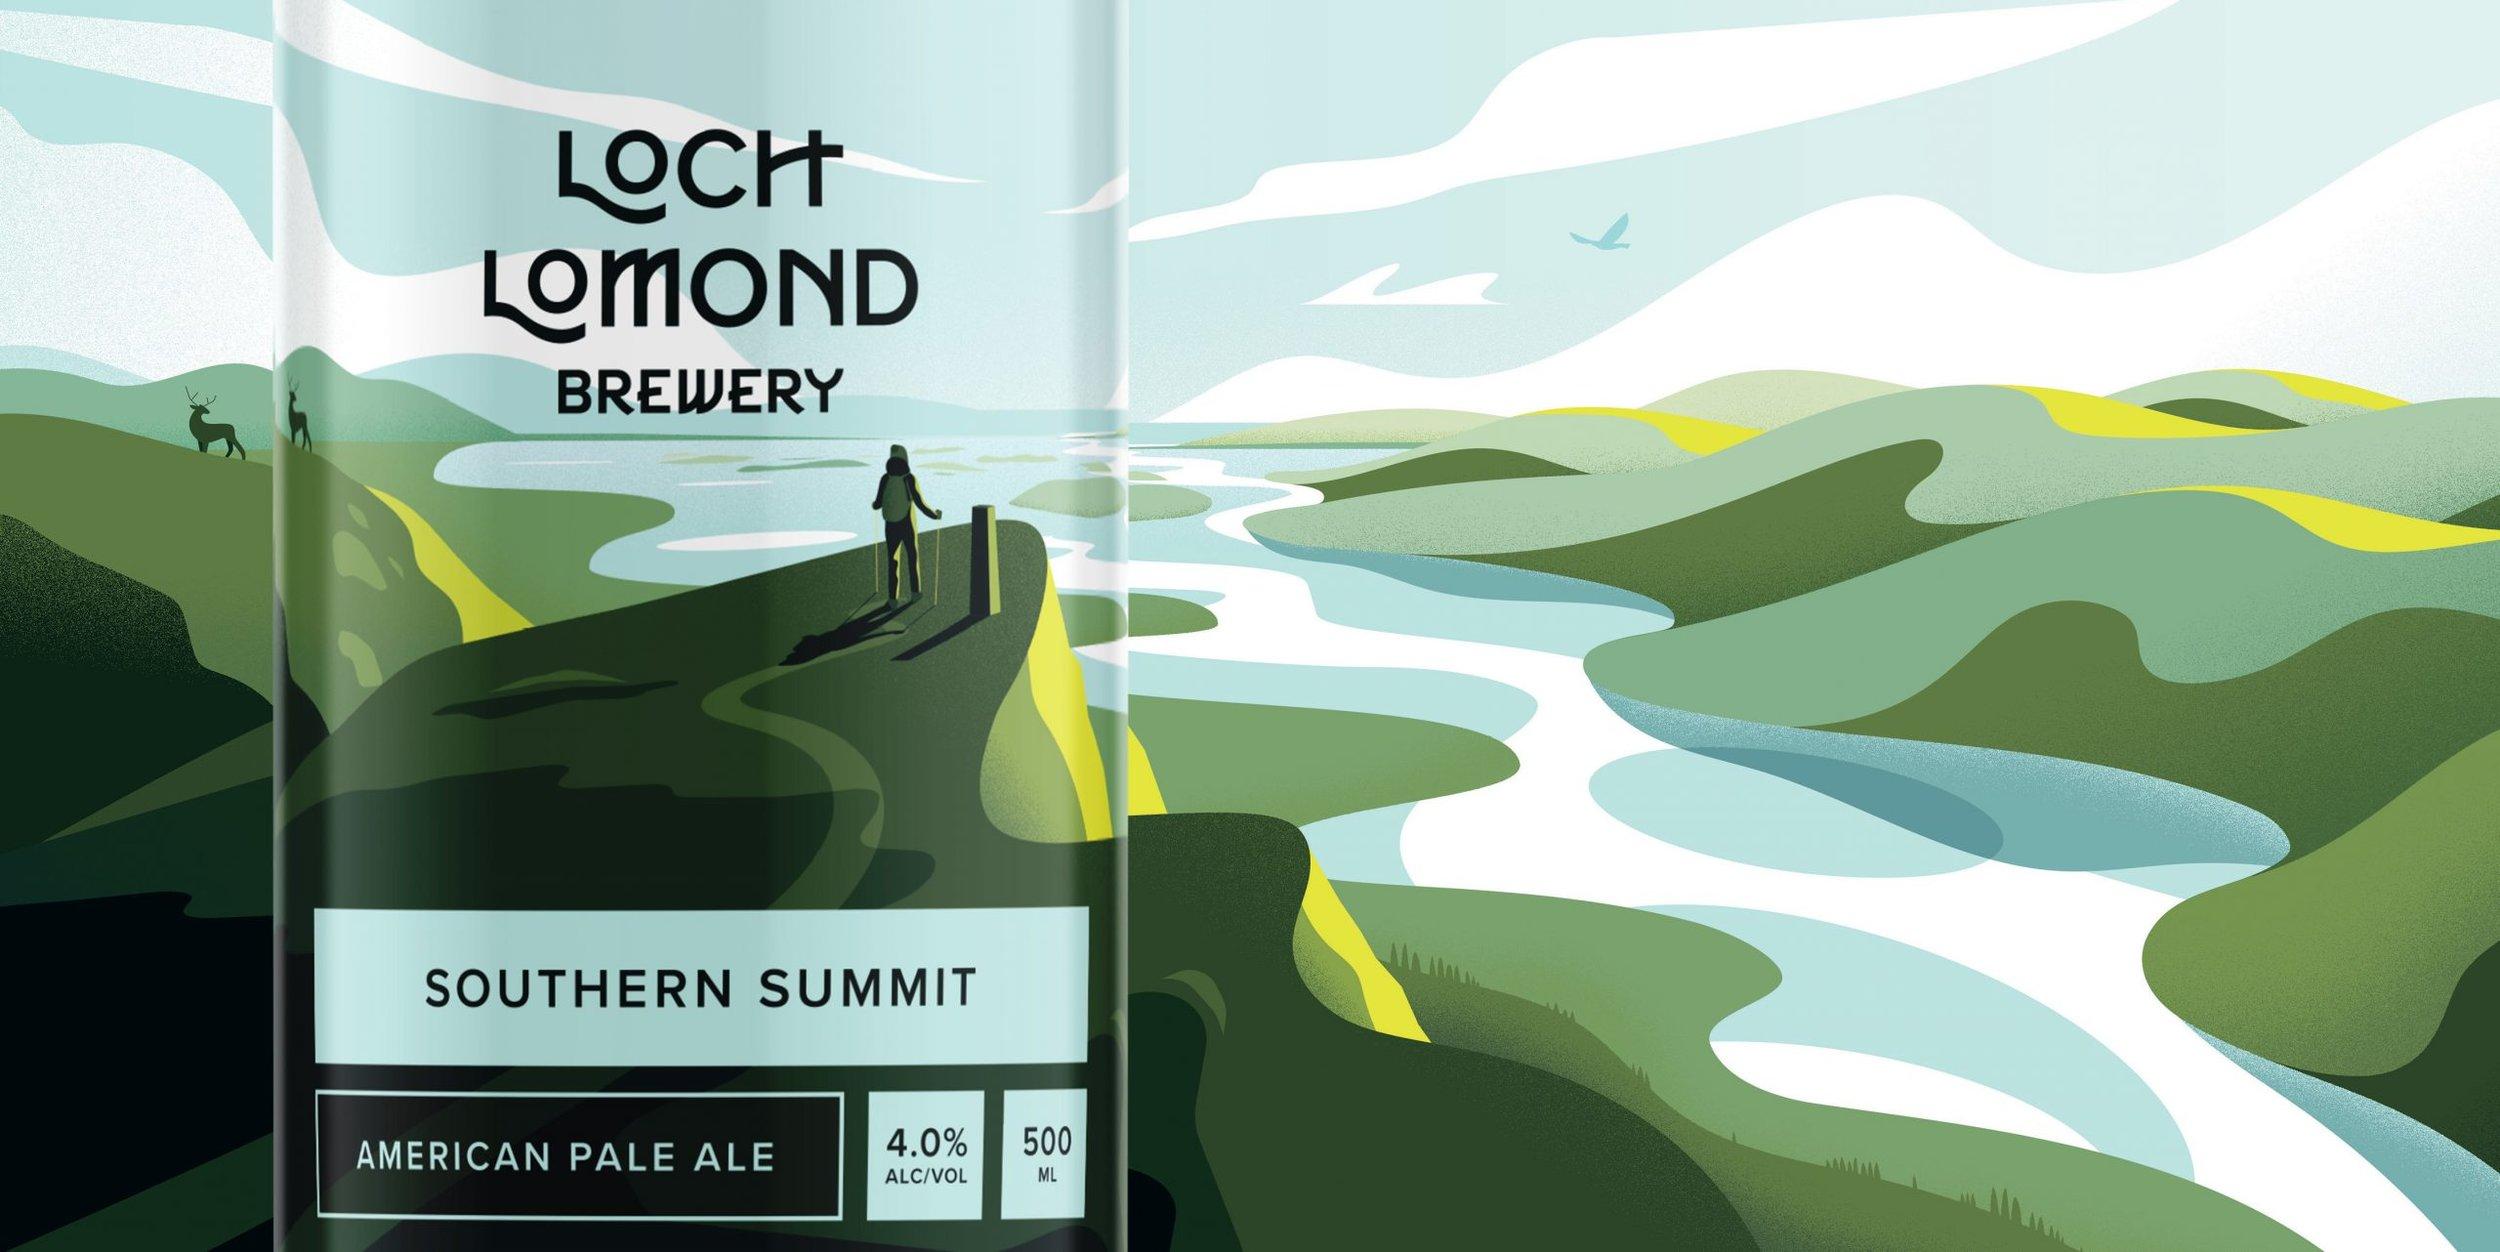 Beer & Branding: Loch Lomond